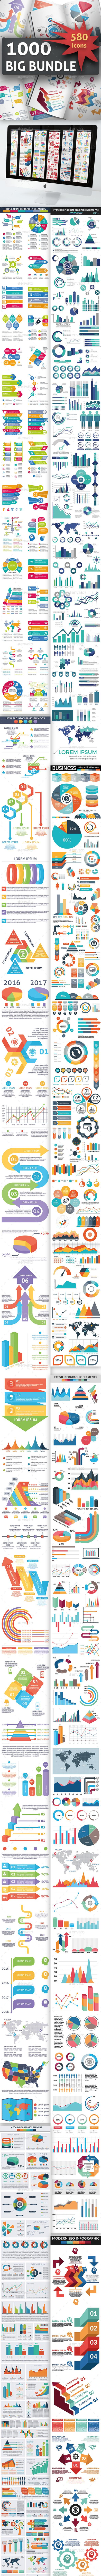 1000 Big Bundle Infographic Elements - Infographics